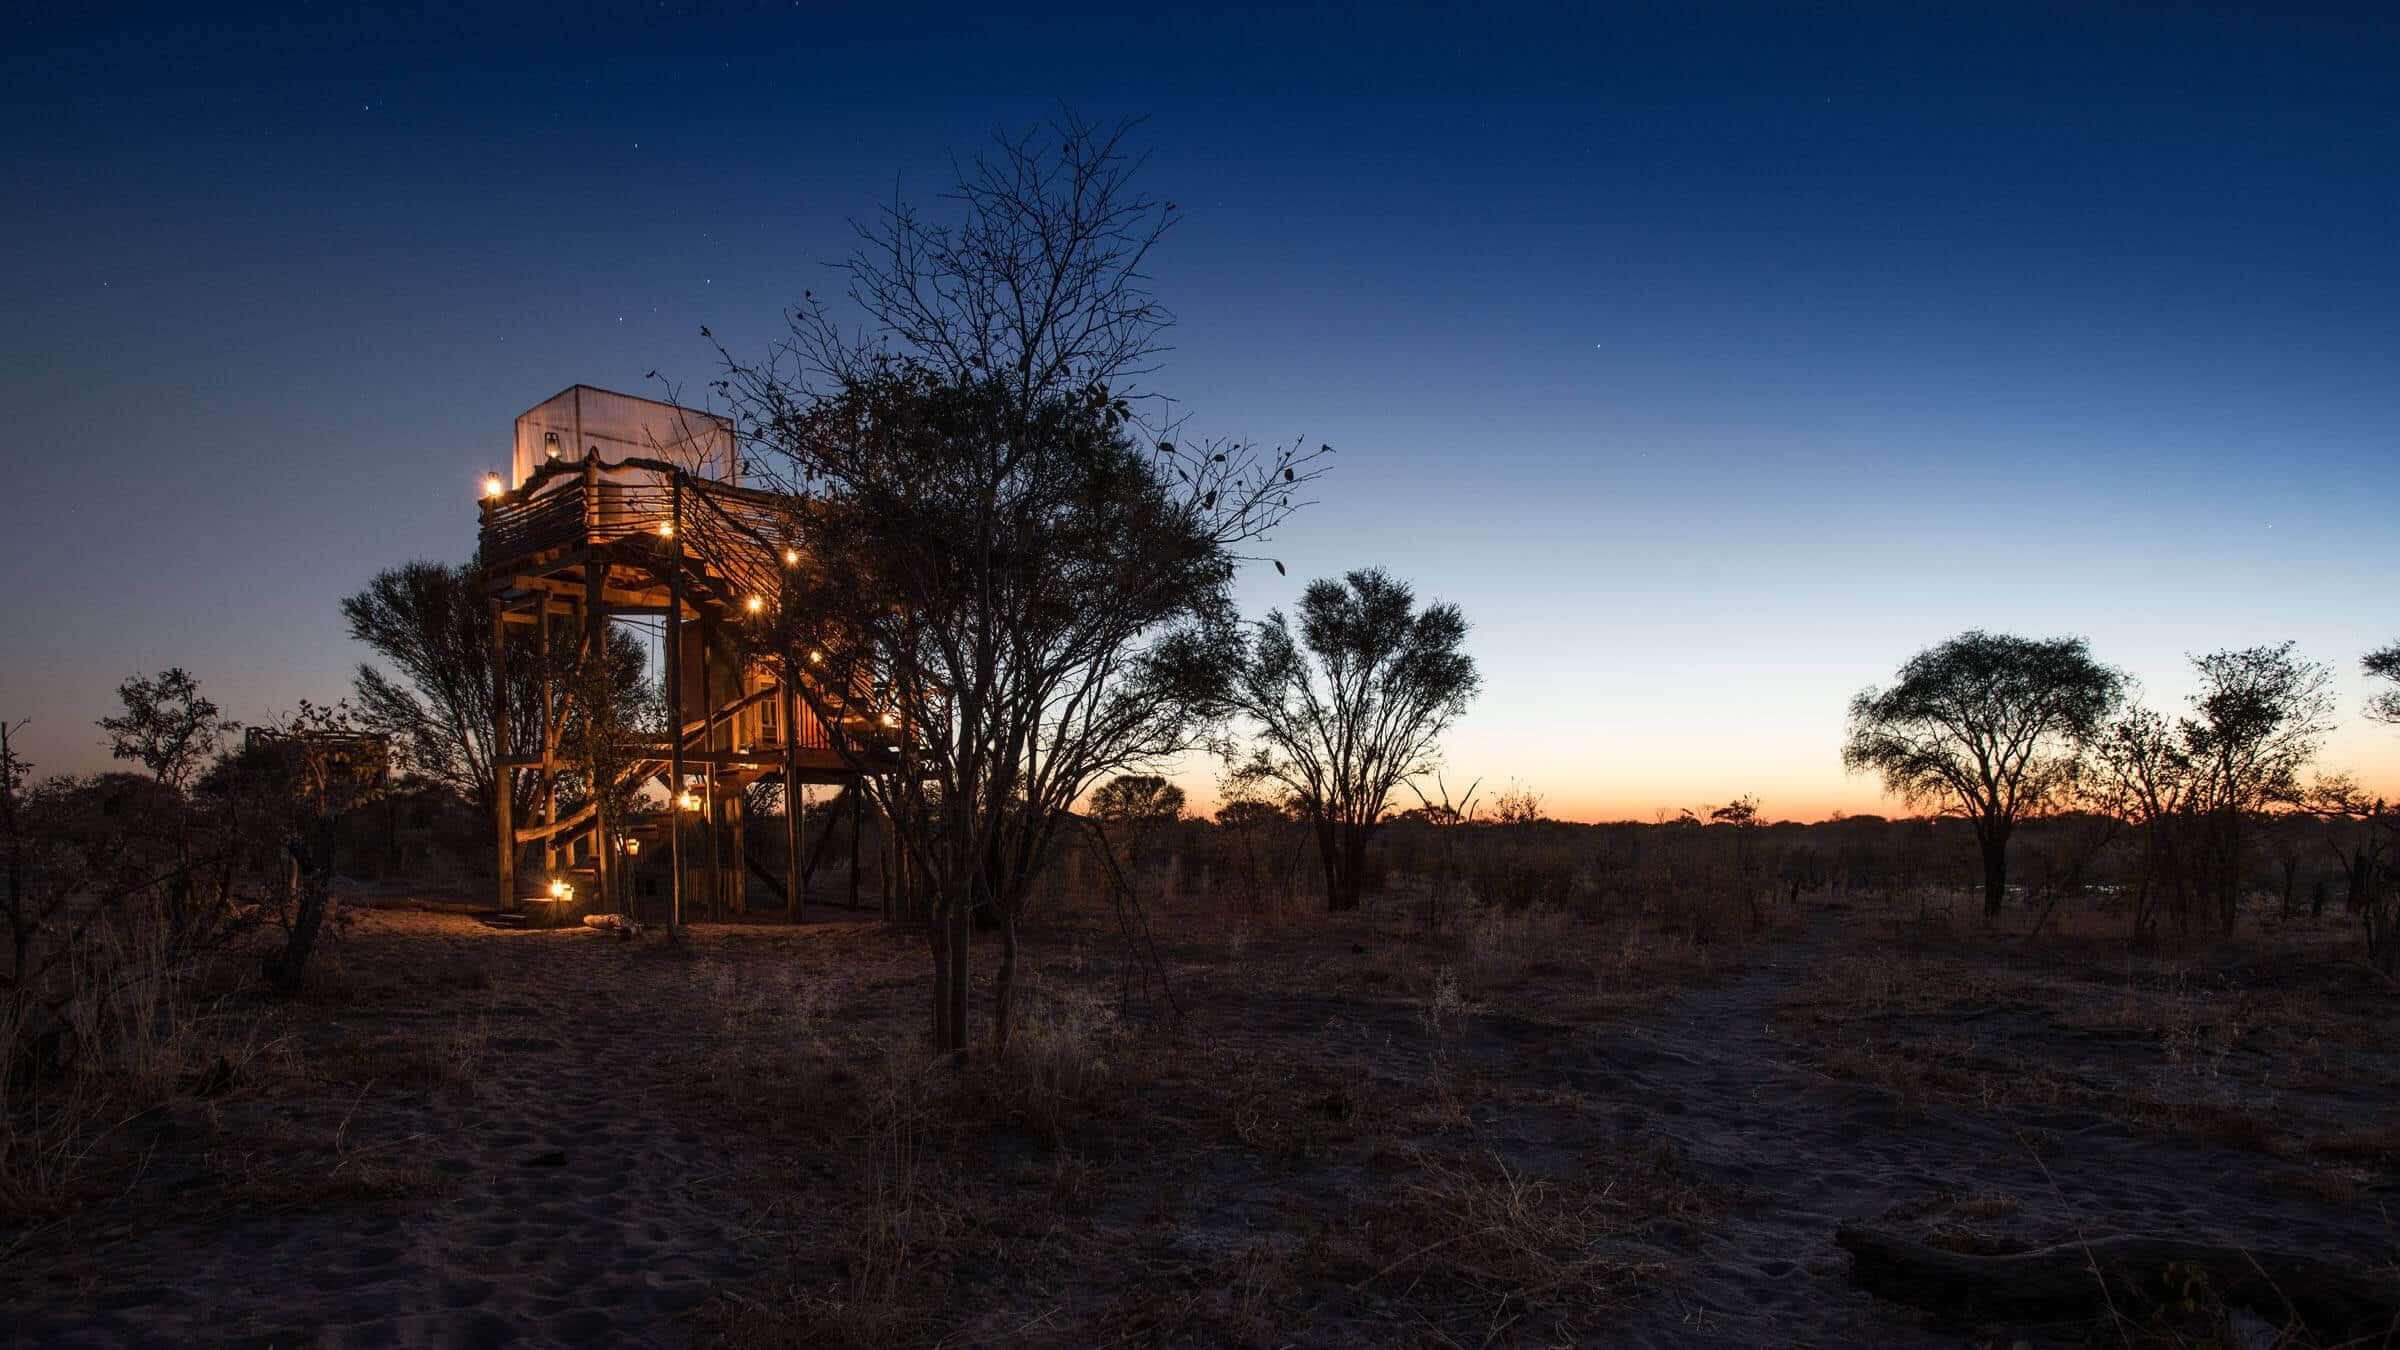 A sunset in Botswana